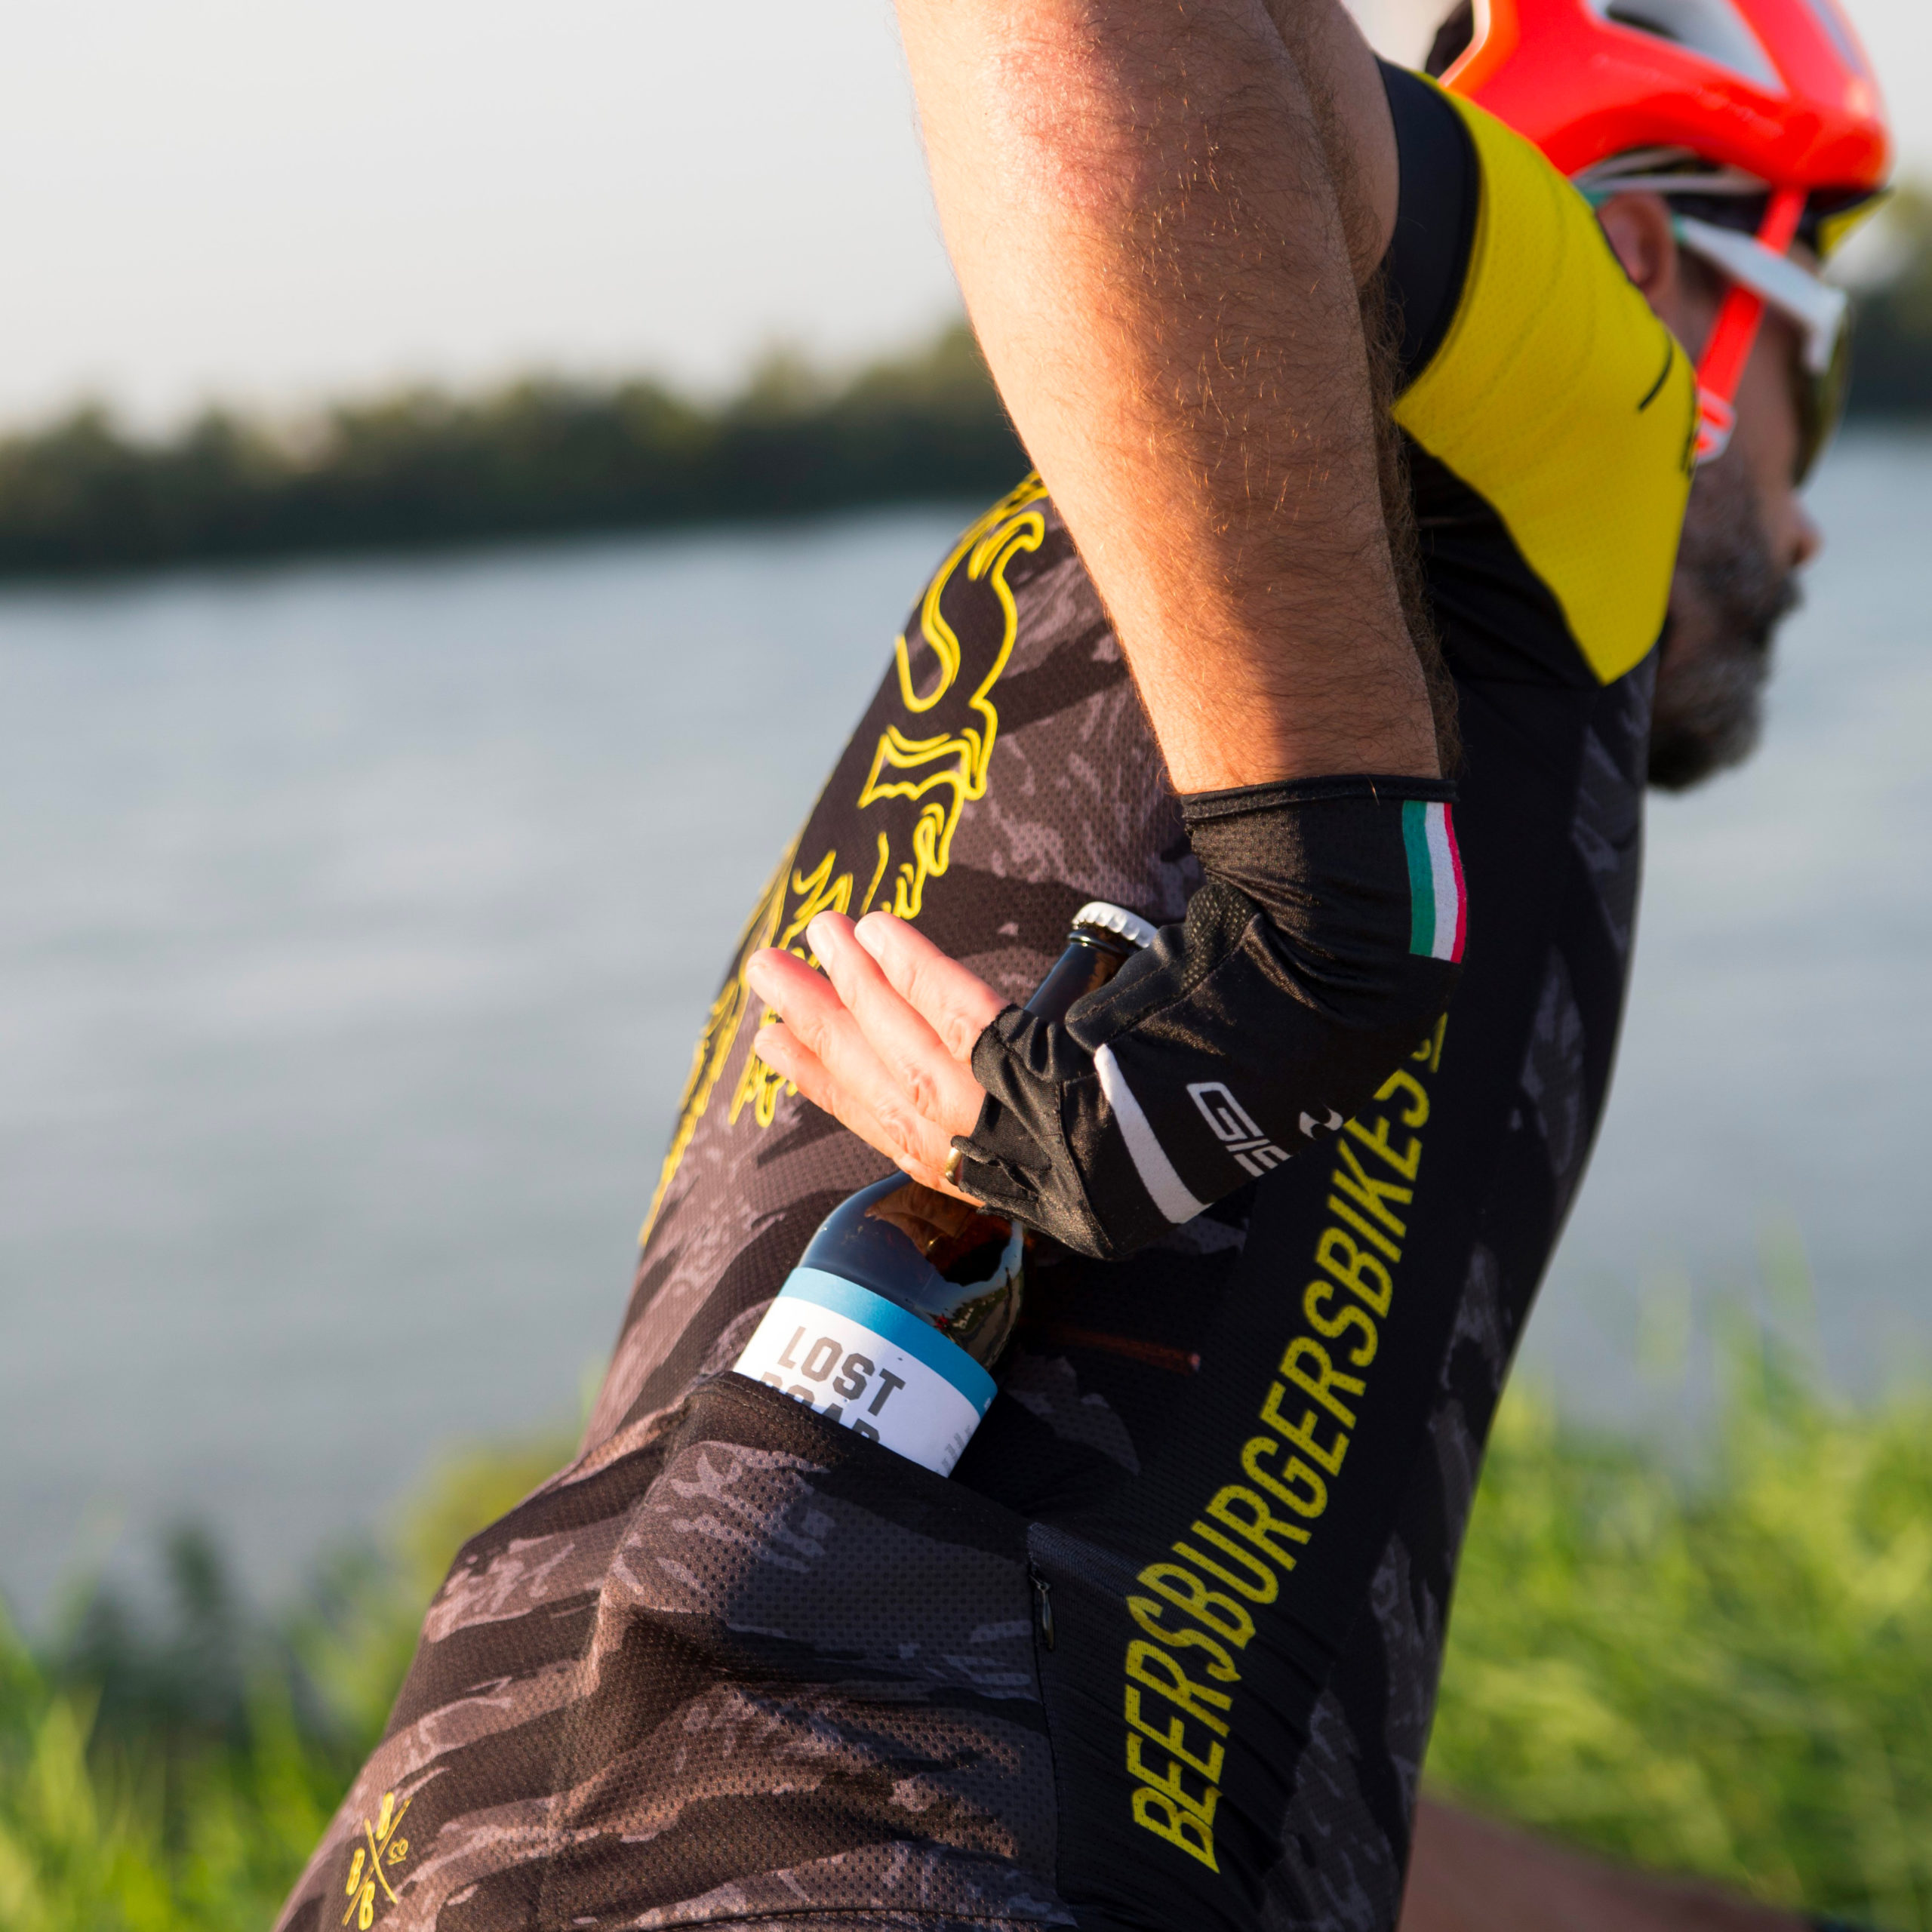 https://www.lostroad.it/wp-content/uploads/2020/11/Bicicletta-birra-ferrara-lost-road-birra-artigianale-scaled.jpg